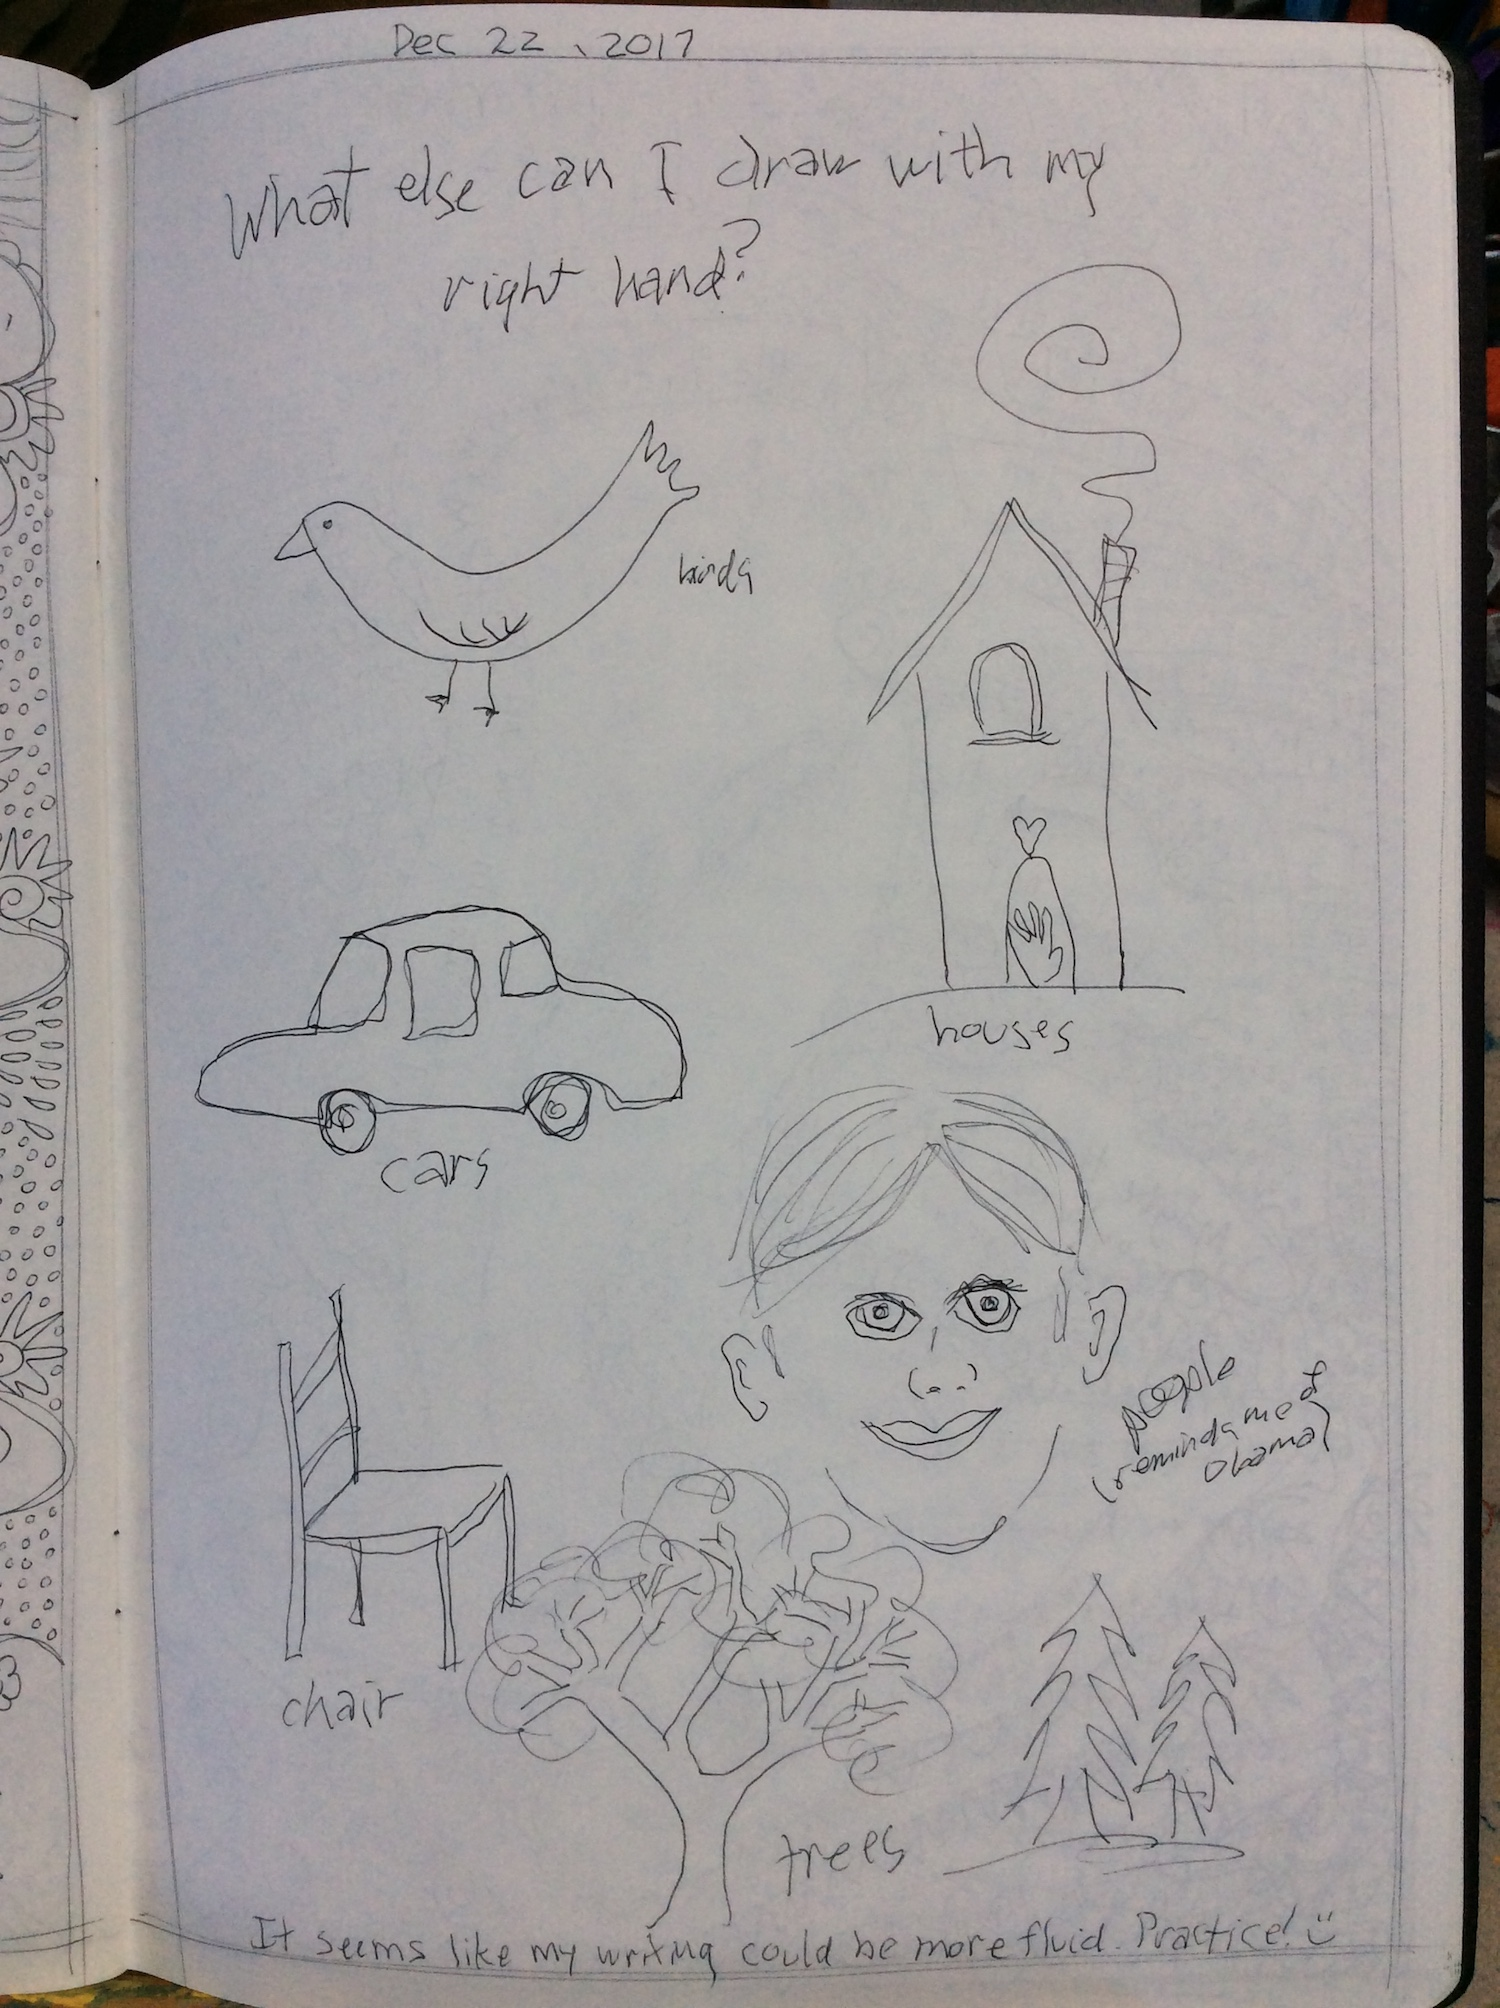 right hand drawing.JPG